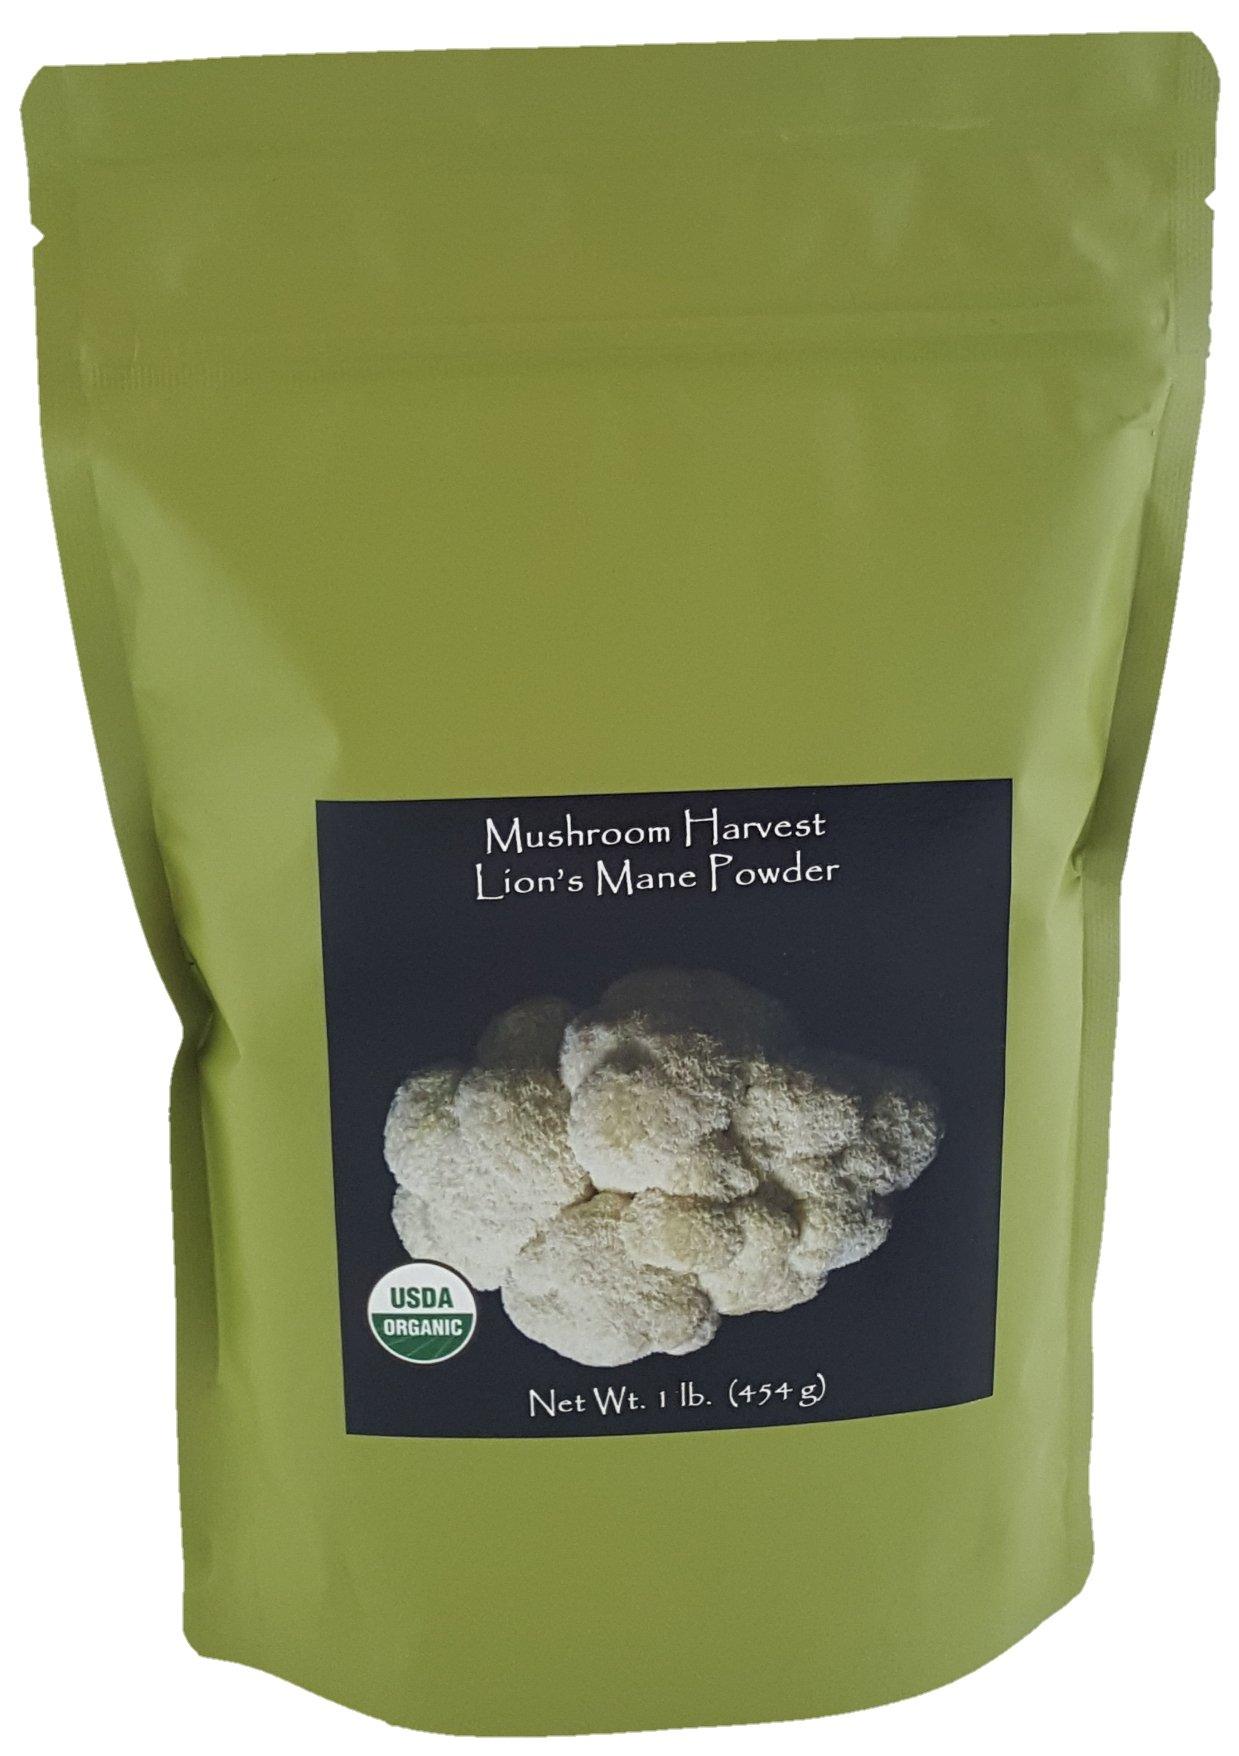 Lions Mane Mushroom Powder Certified Organic 1lb. Bulk